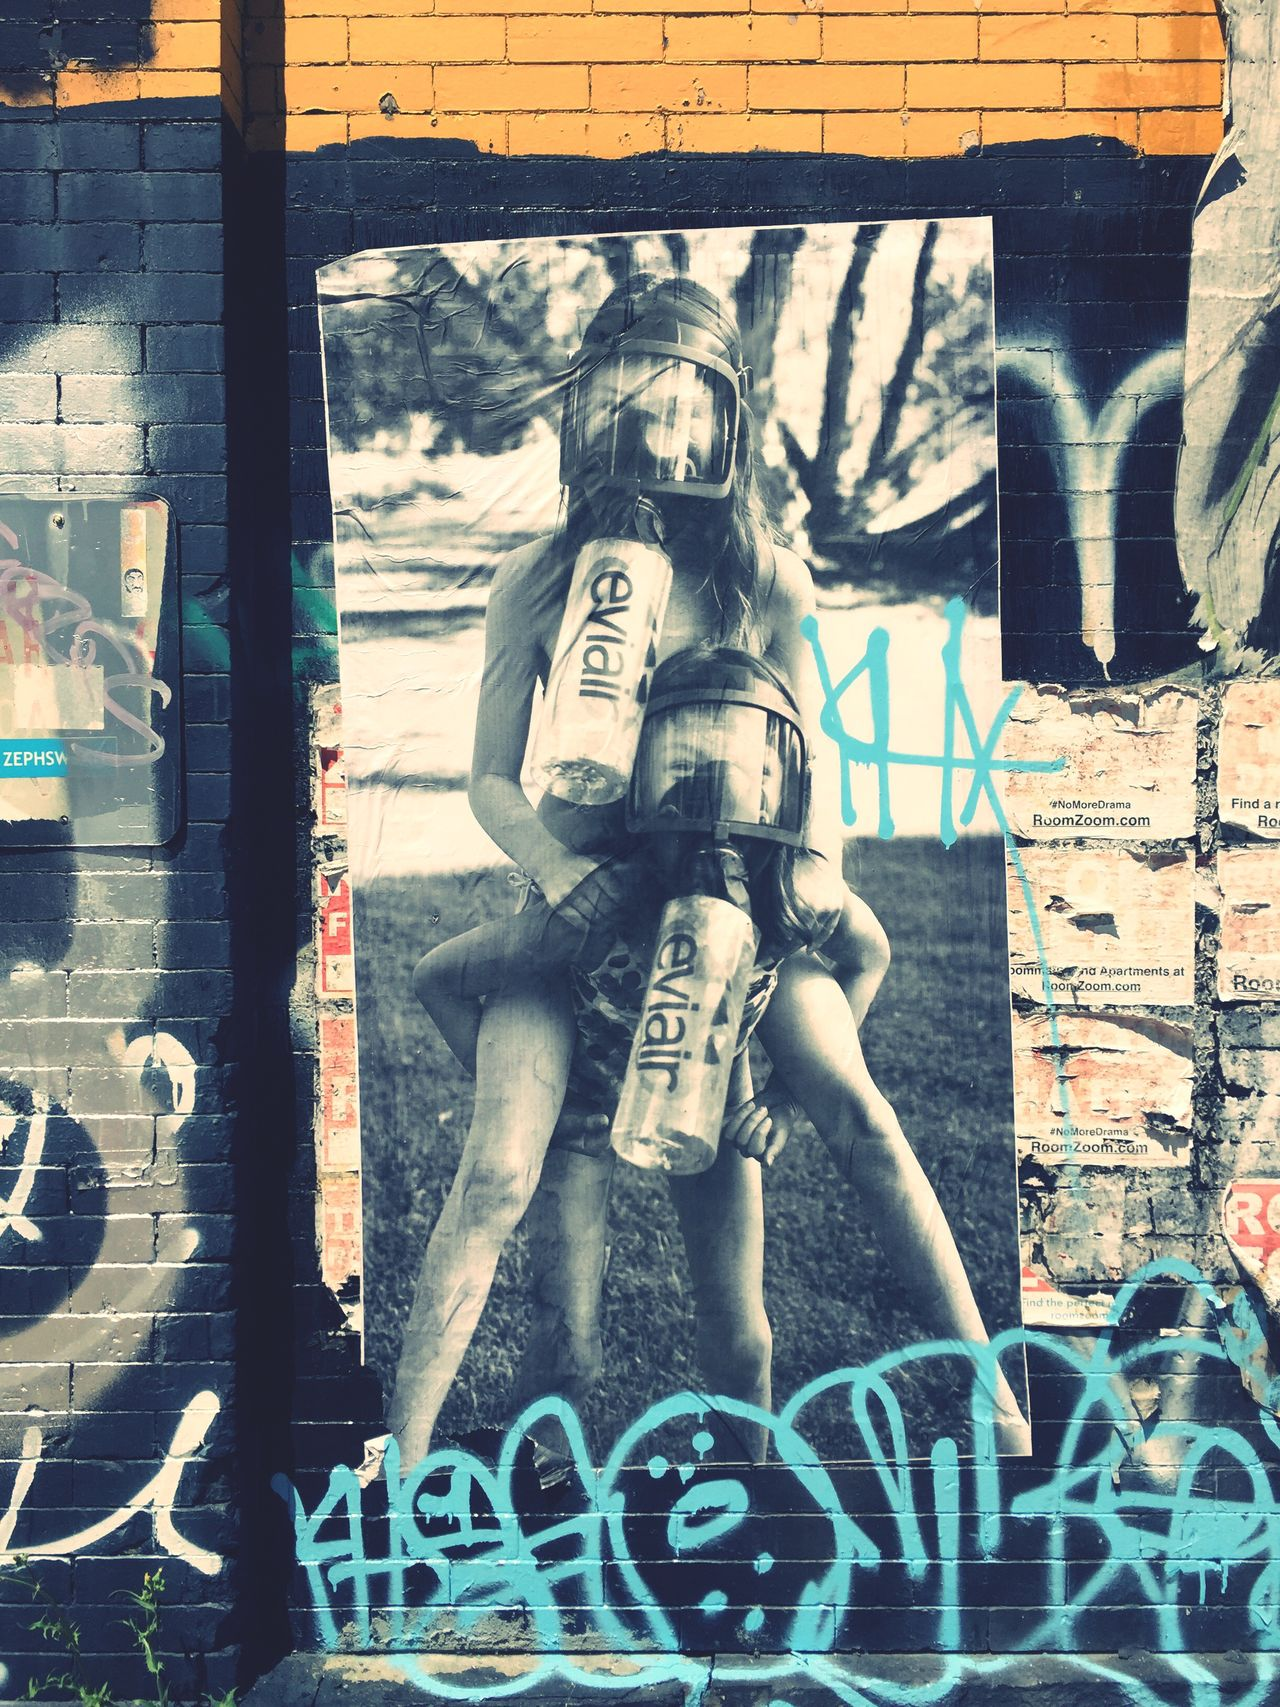 Streetart #street #streetphotography #tagsforlikes #sprayart #urban #urbanart #urbanwalls #wall #wallporn #graffitiigers #stencilart #art #graffiti #instagraffiti #instagood #artwork #mural #graffitiporn #photooftheday #stencil #streetartistry #photograp Williamsburg Evianair